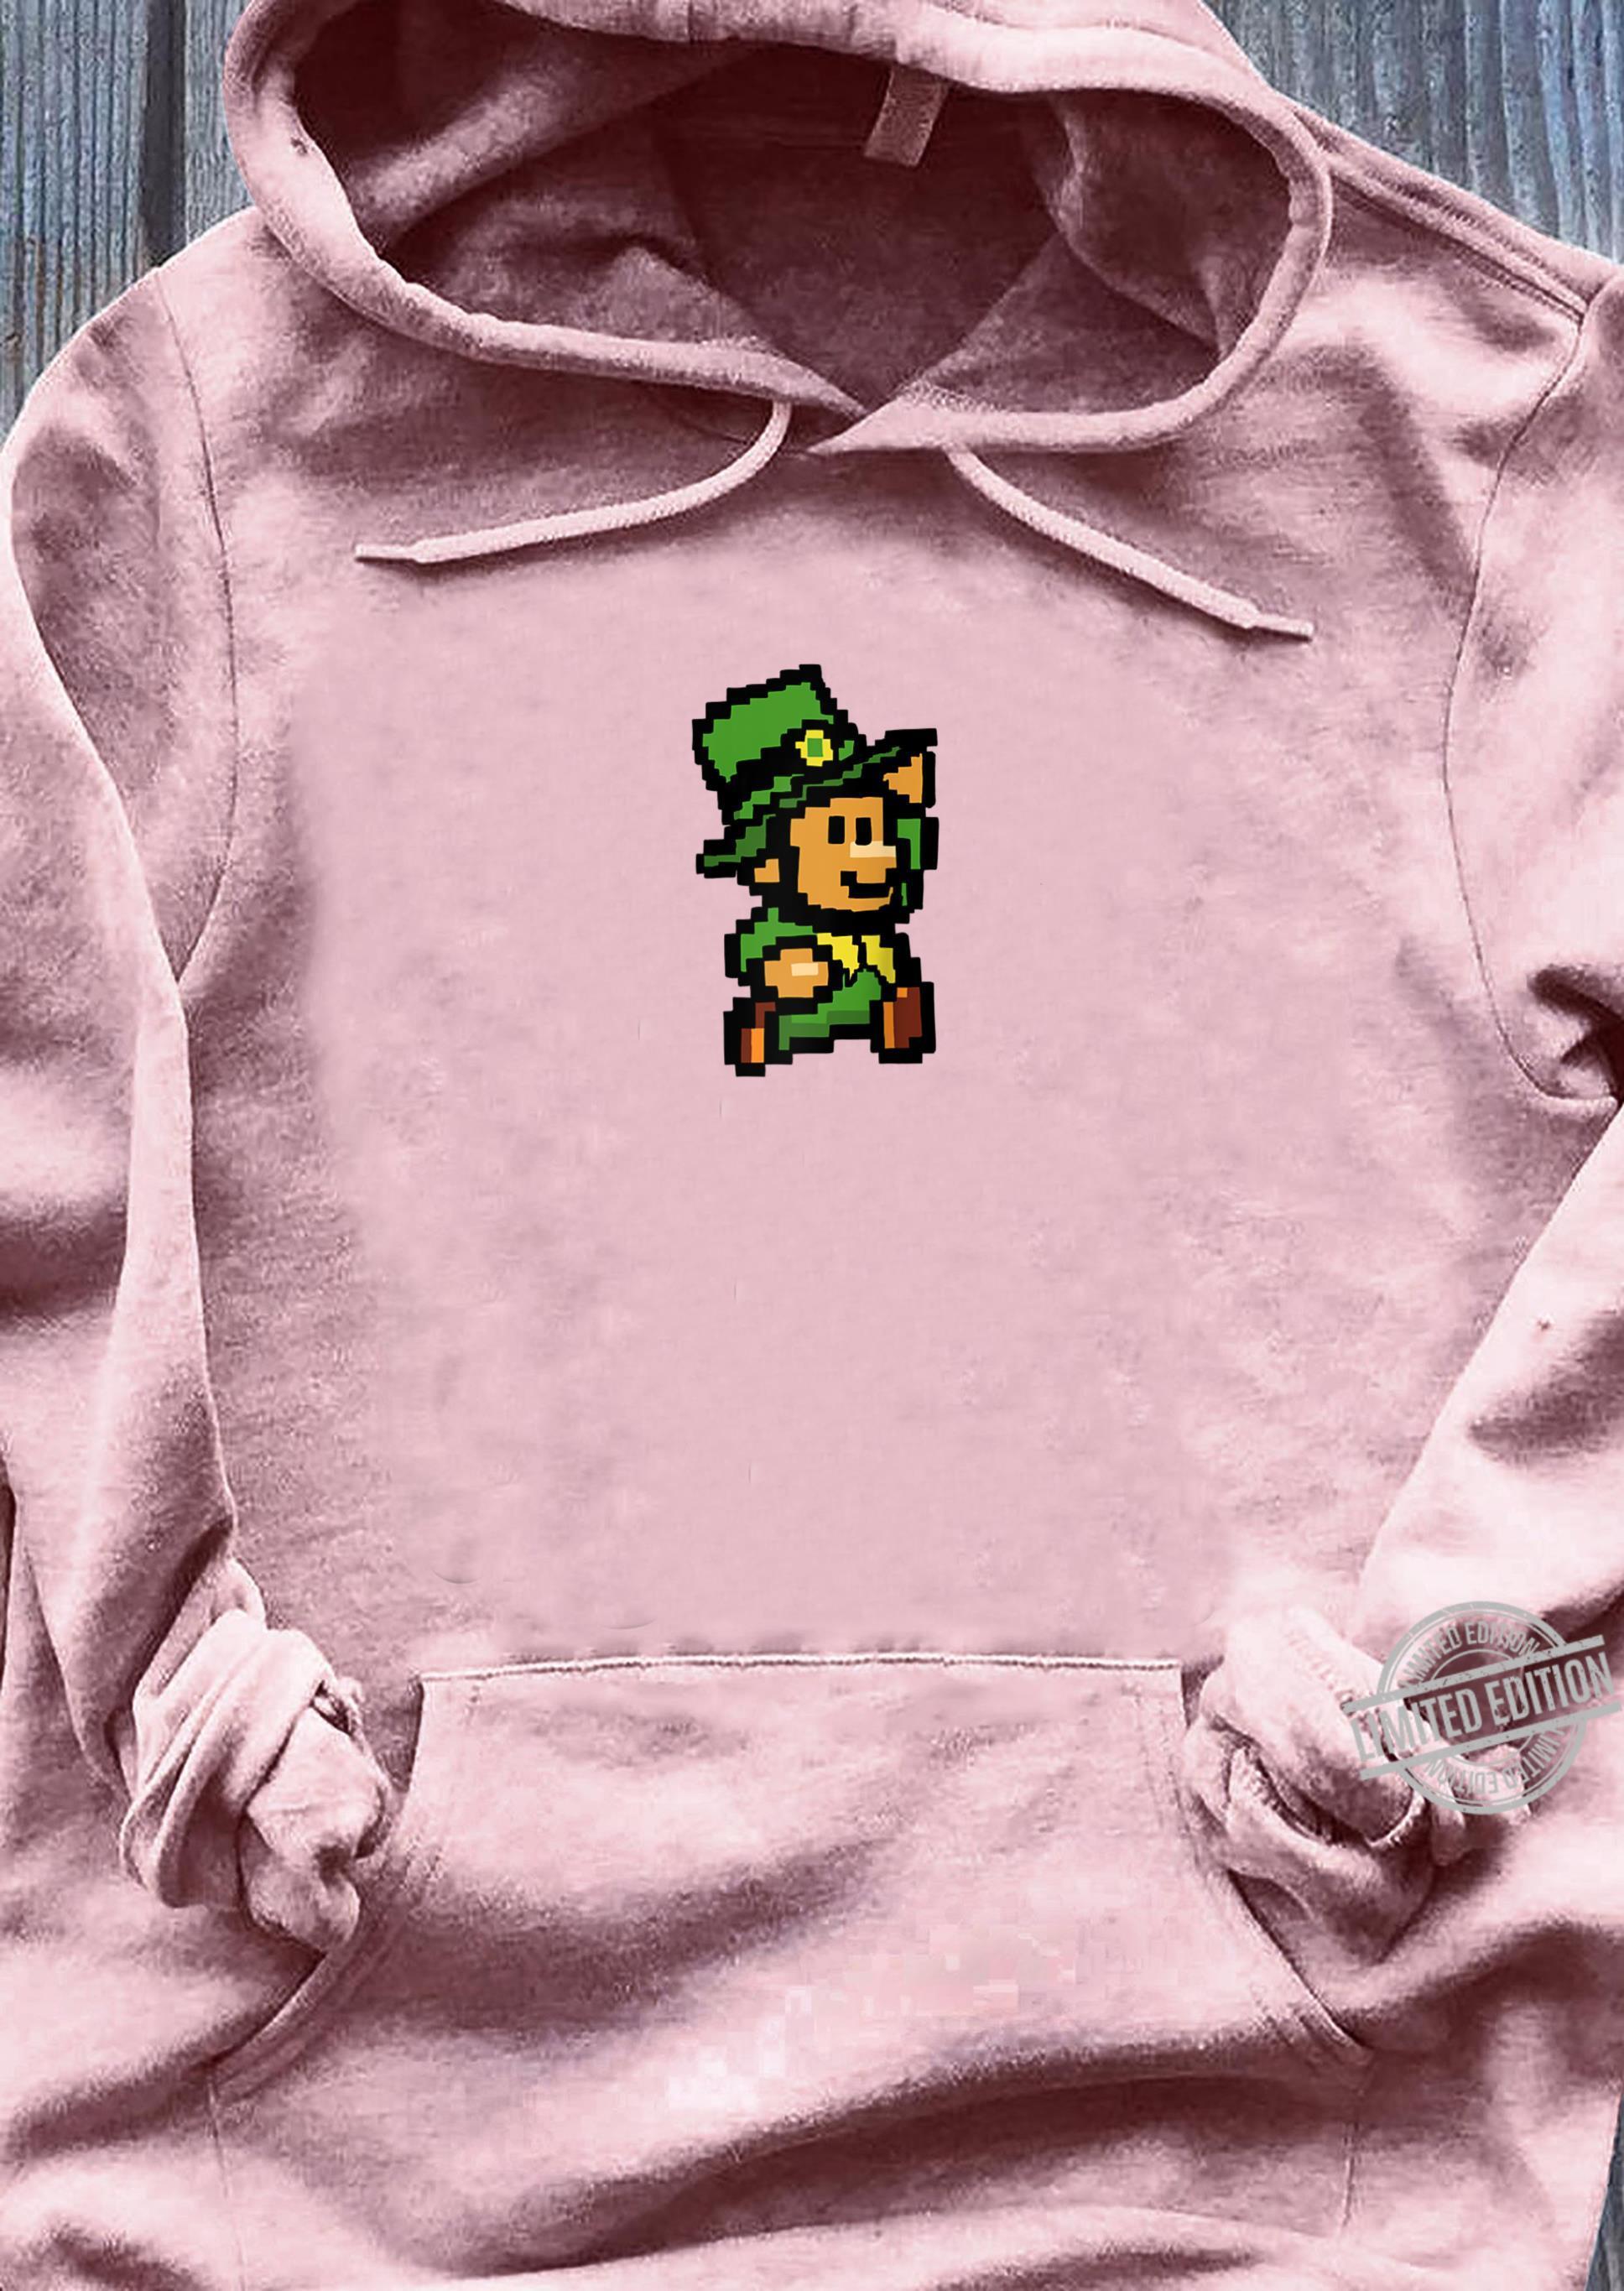 Super Leprechaun bro 8bit leprechaun video game Shirt ladies tee